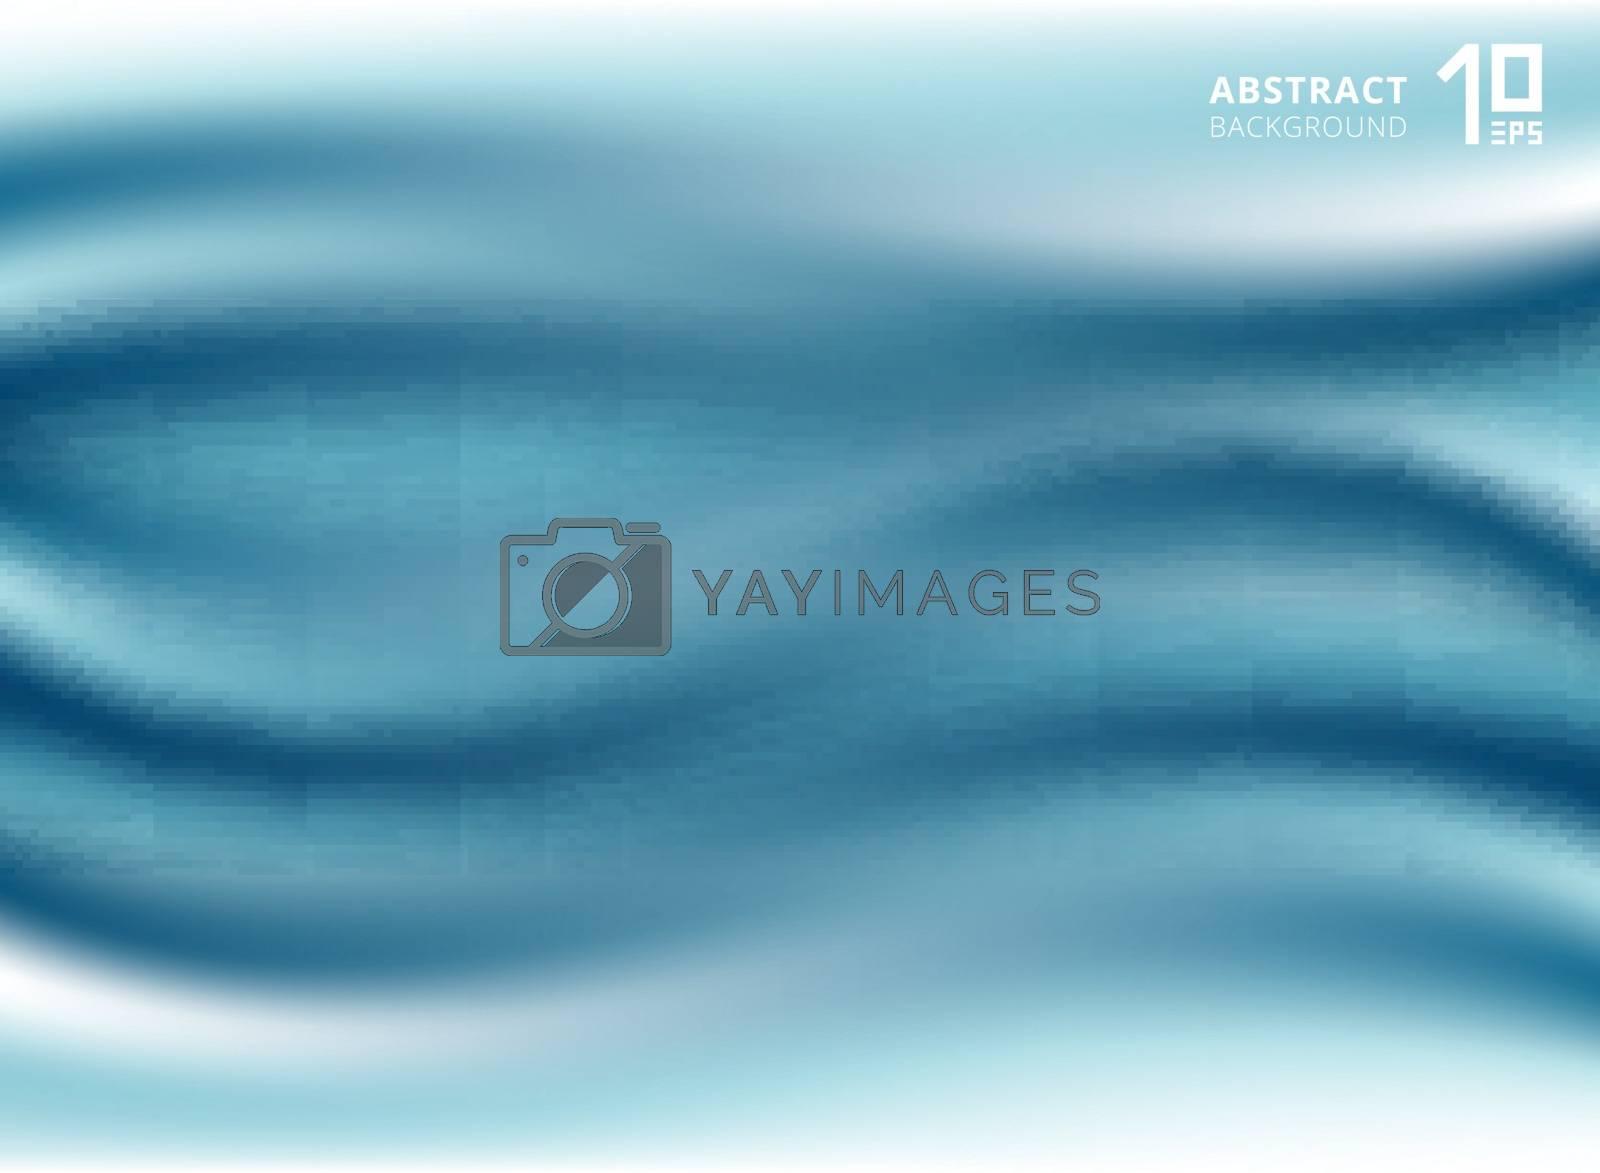 Luxury beautiful blue cloth or liquid wave or wavy folds silk texture satin. Drapery Background. Vector Illustration